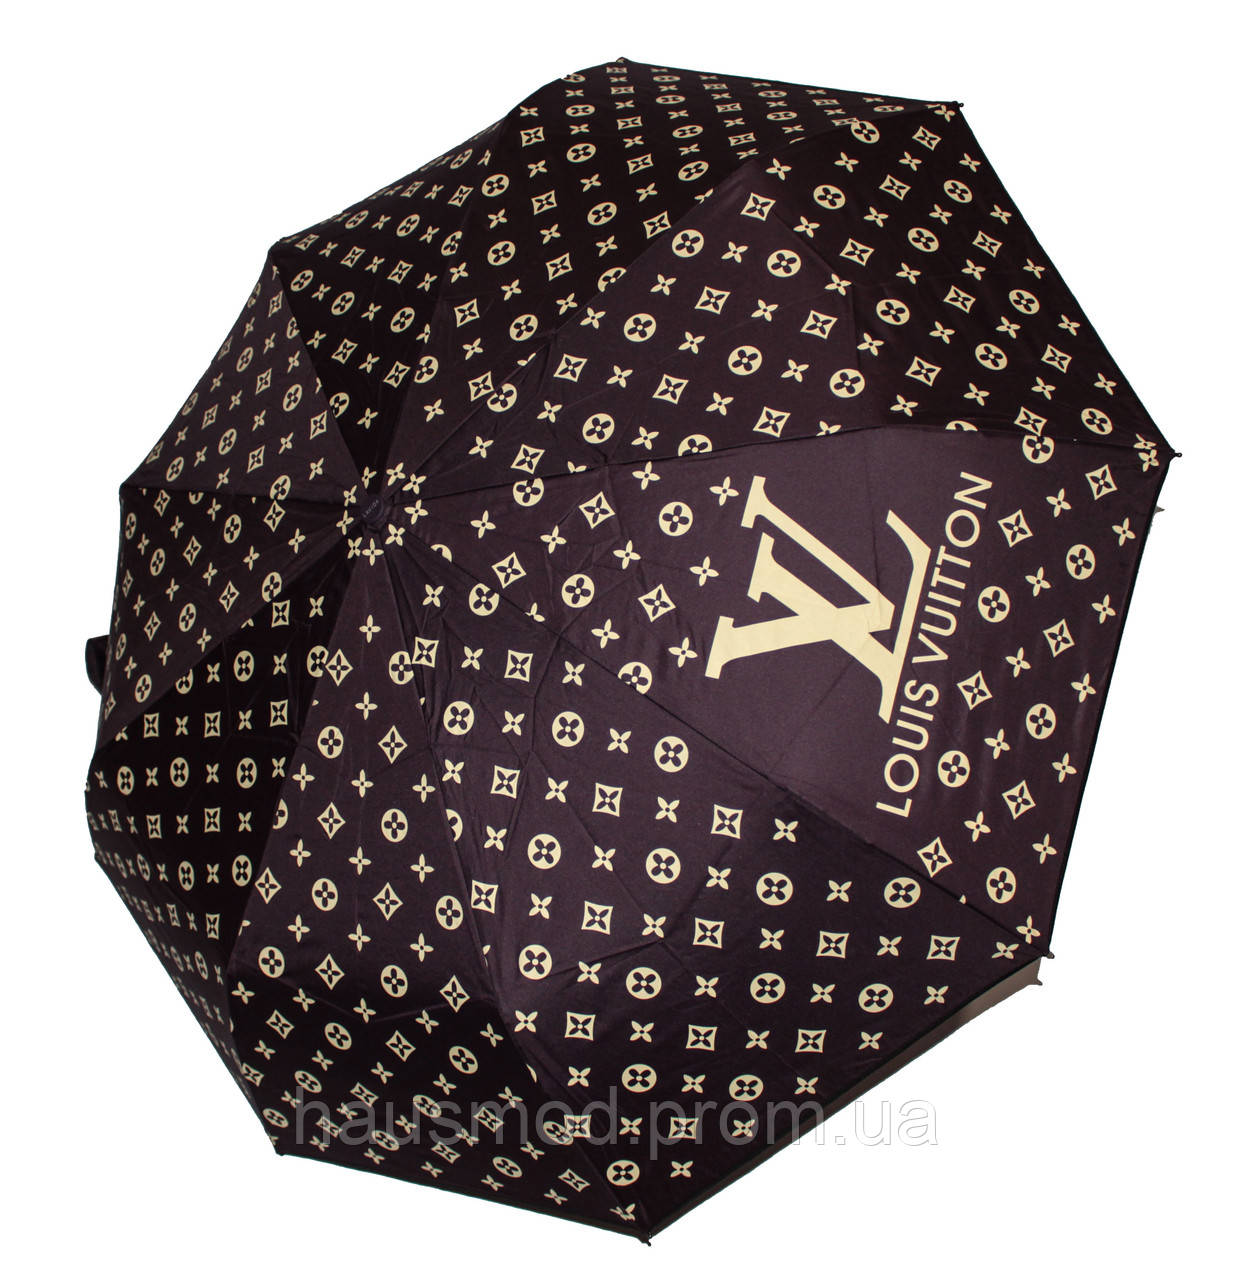 Женский зонт реплика Louis Vuitton полуавтомат баклажан